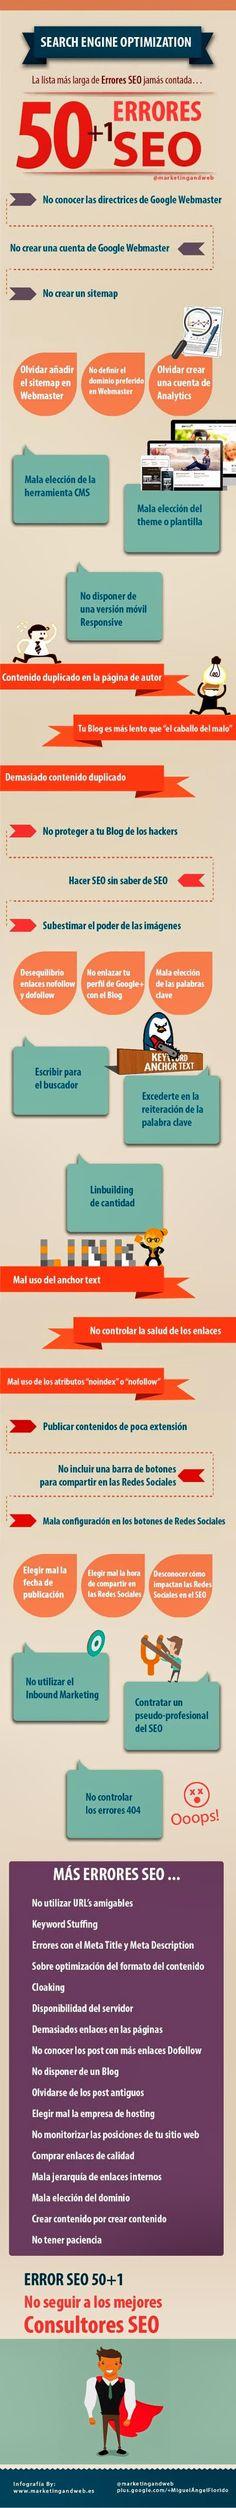 Diseño web, #SEO: 51  #errores SEO